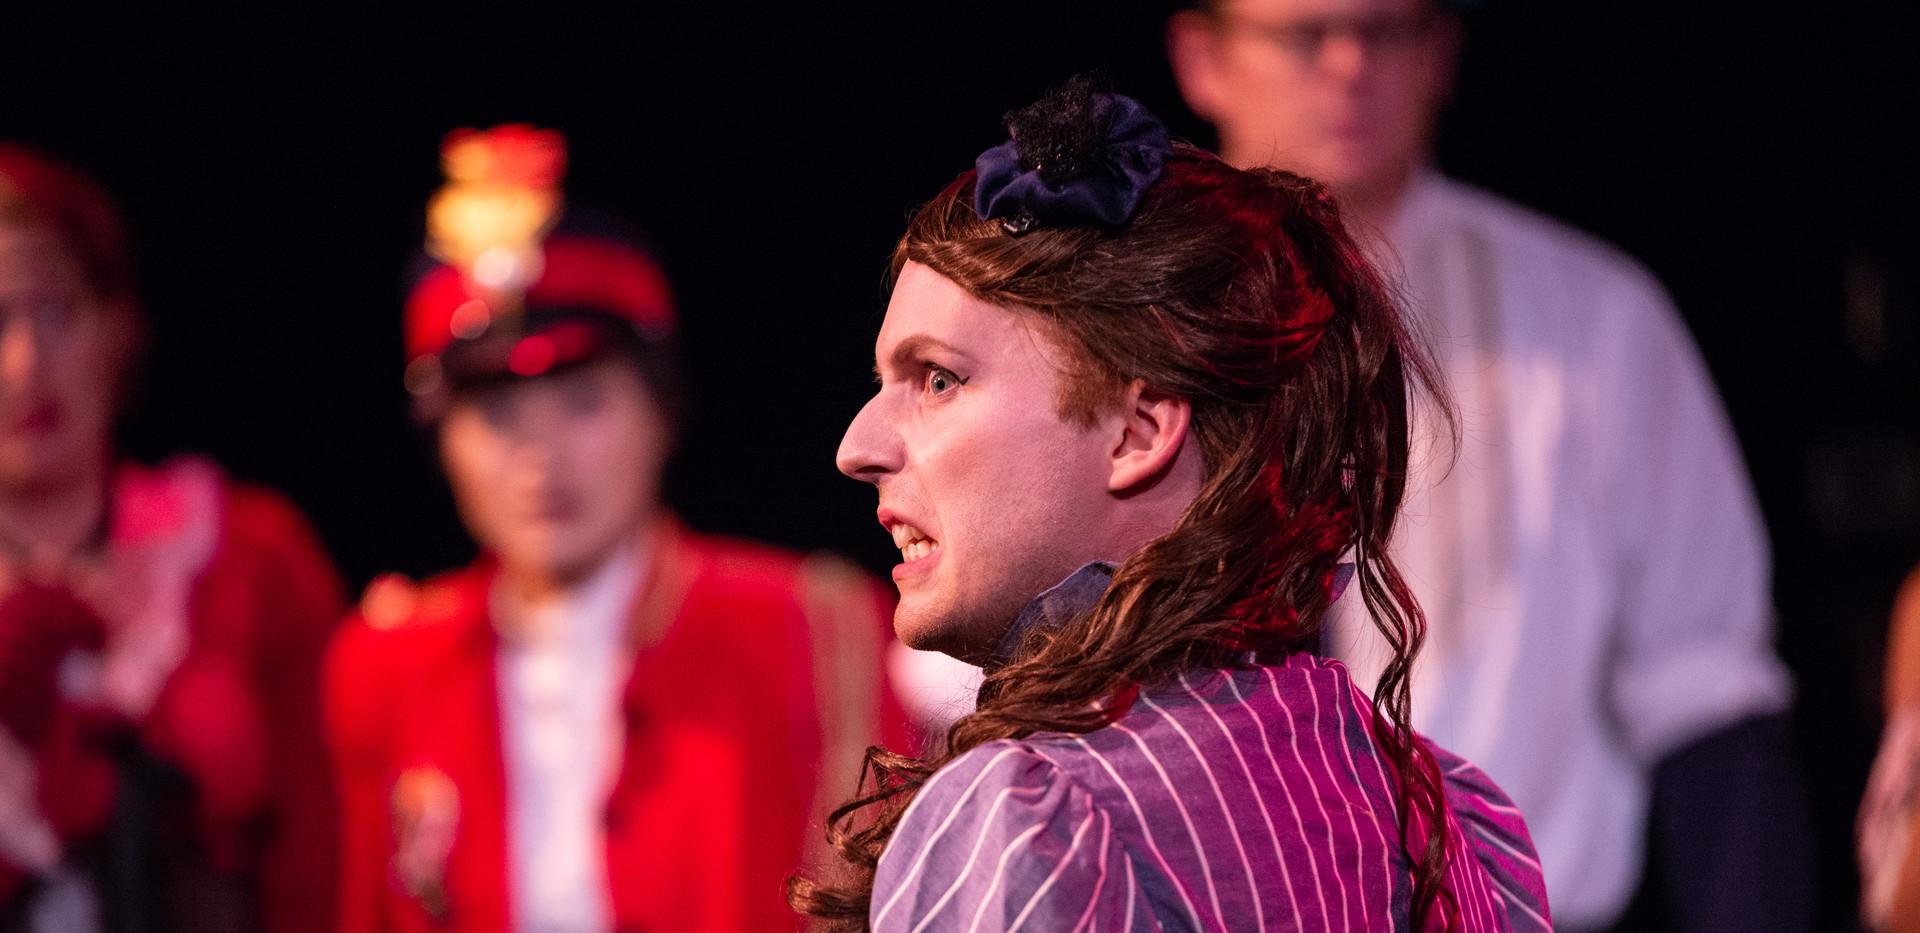 Kelvyn Koning as Helena Landless